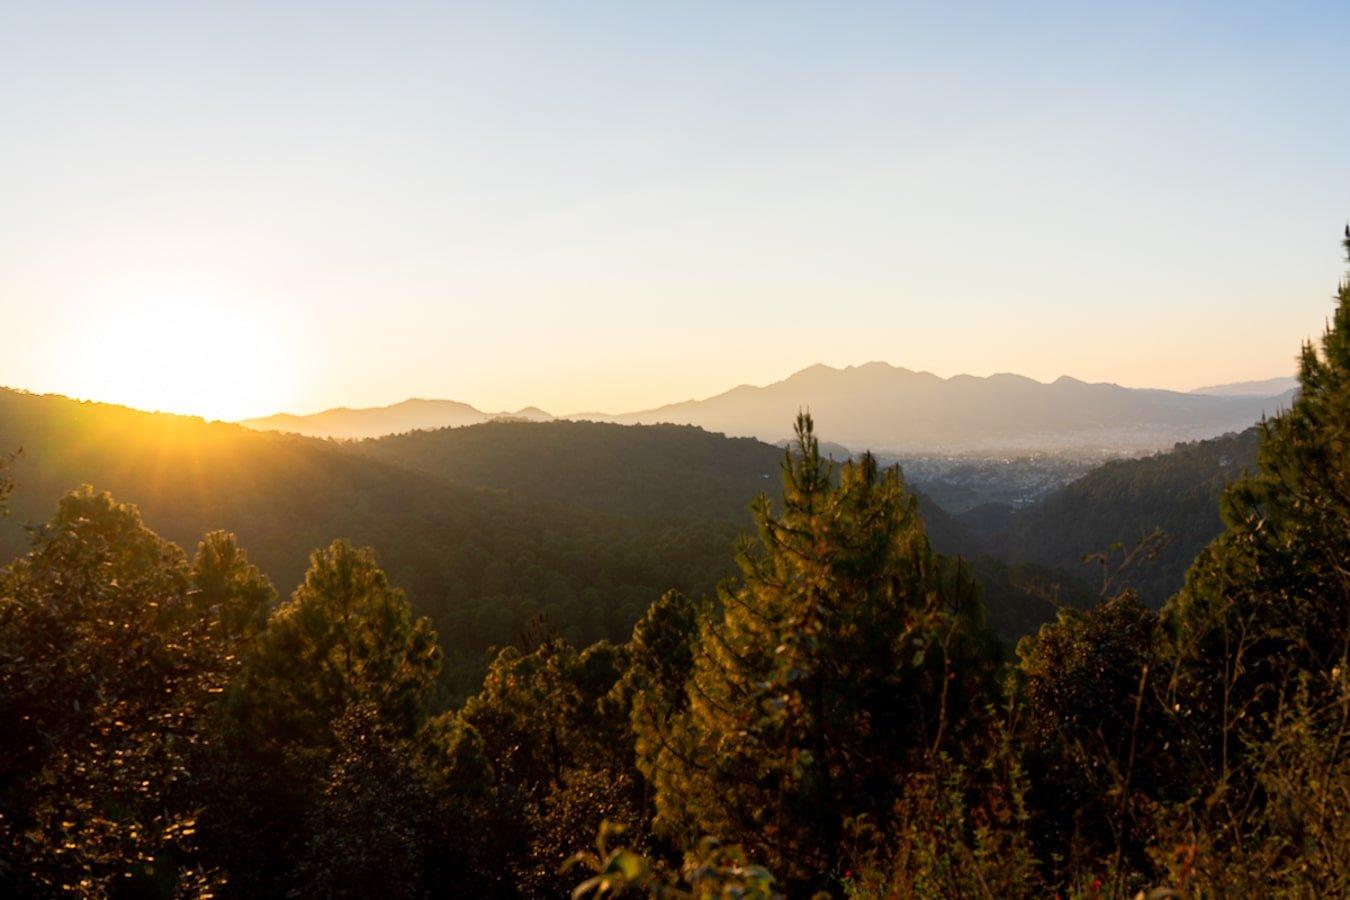 sunset and mountains overlooking san cristobal de las casas